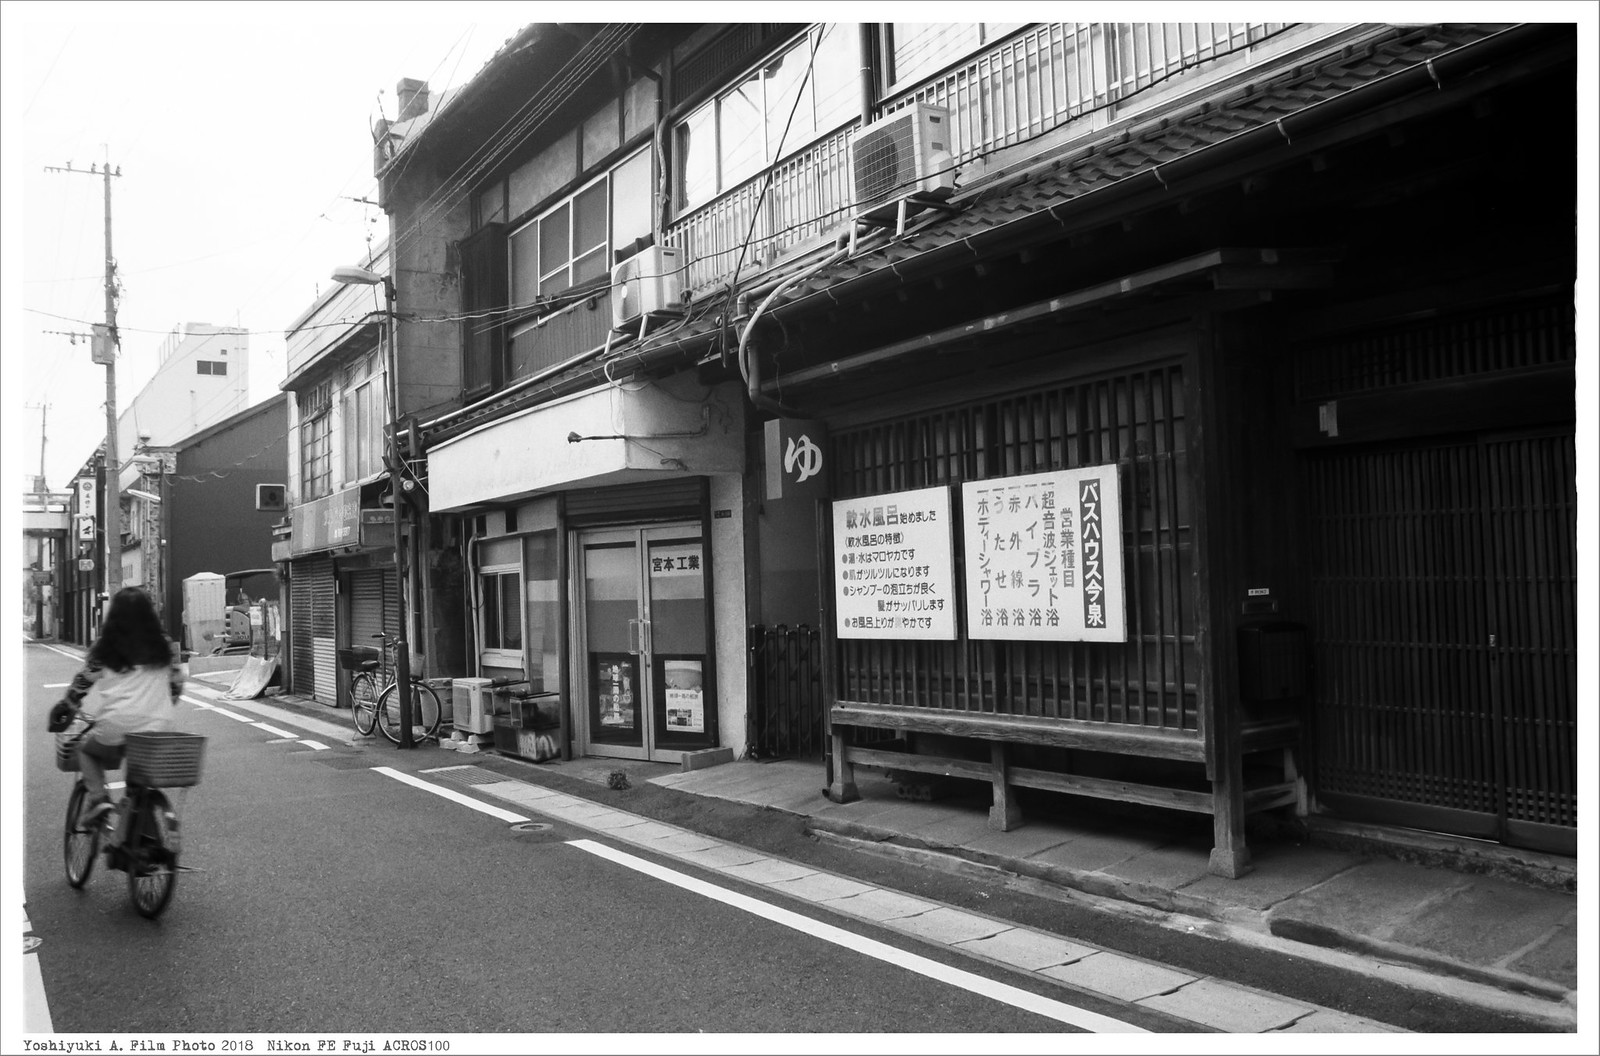 北九州市若松区 Nikon_FE_Fuji_Acros100__48